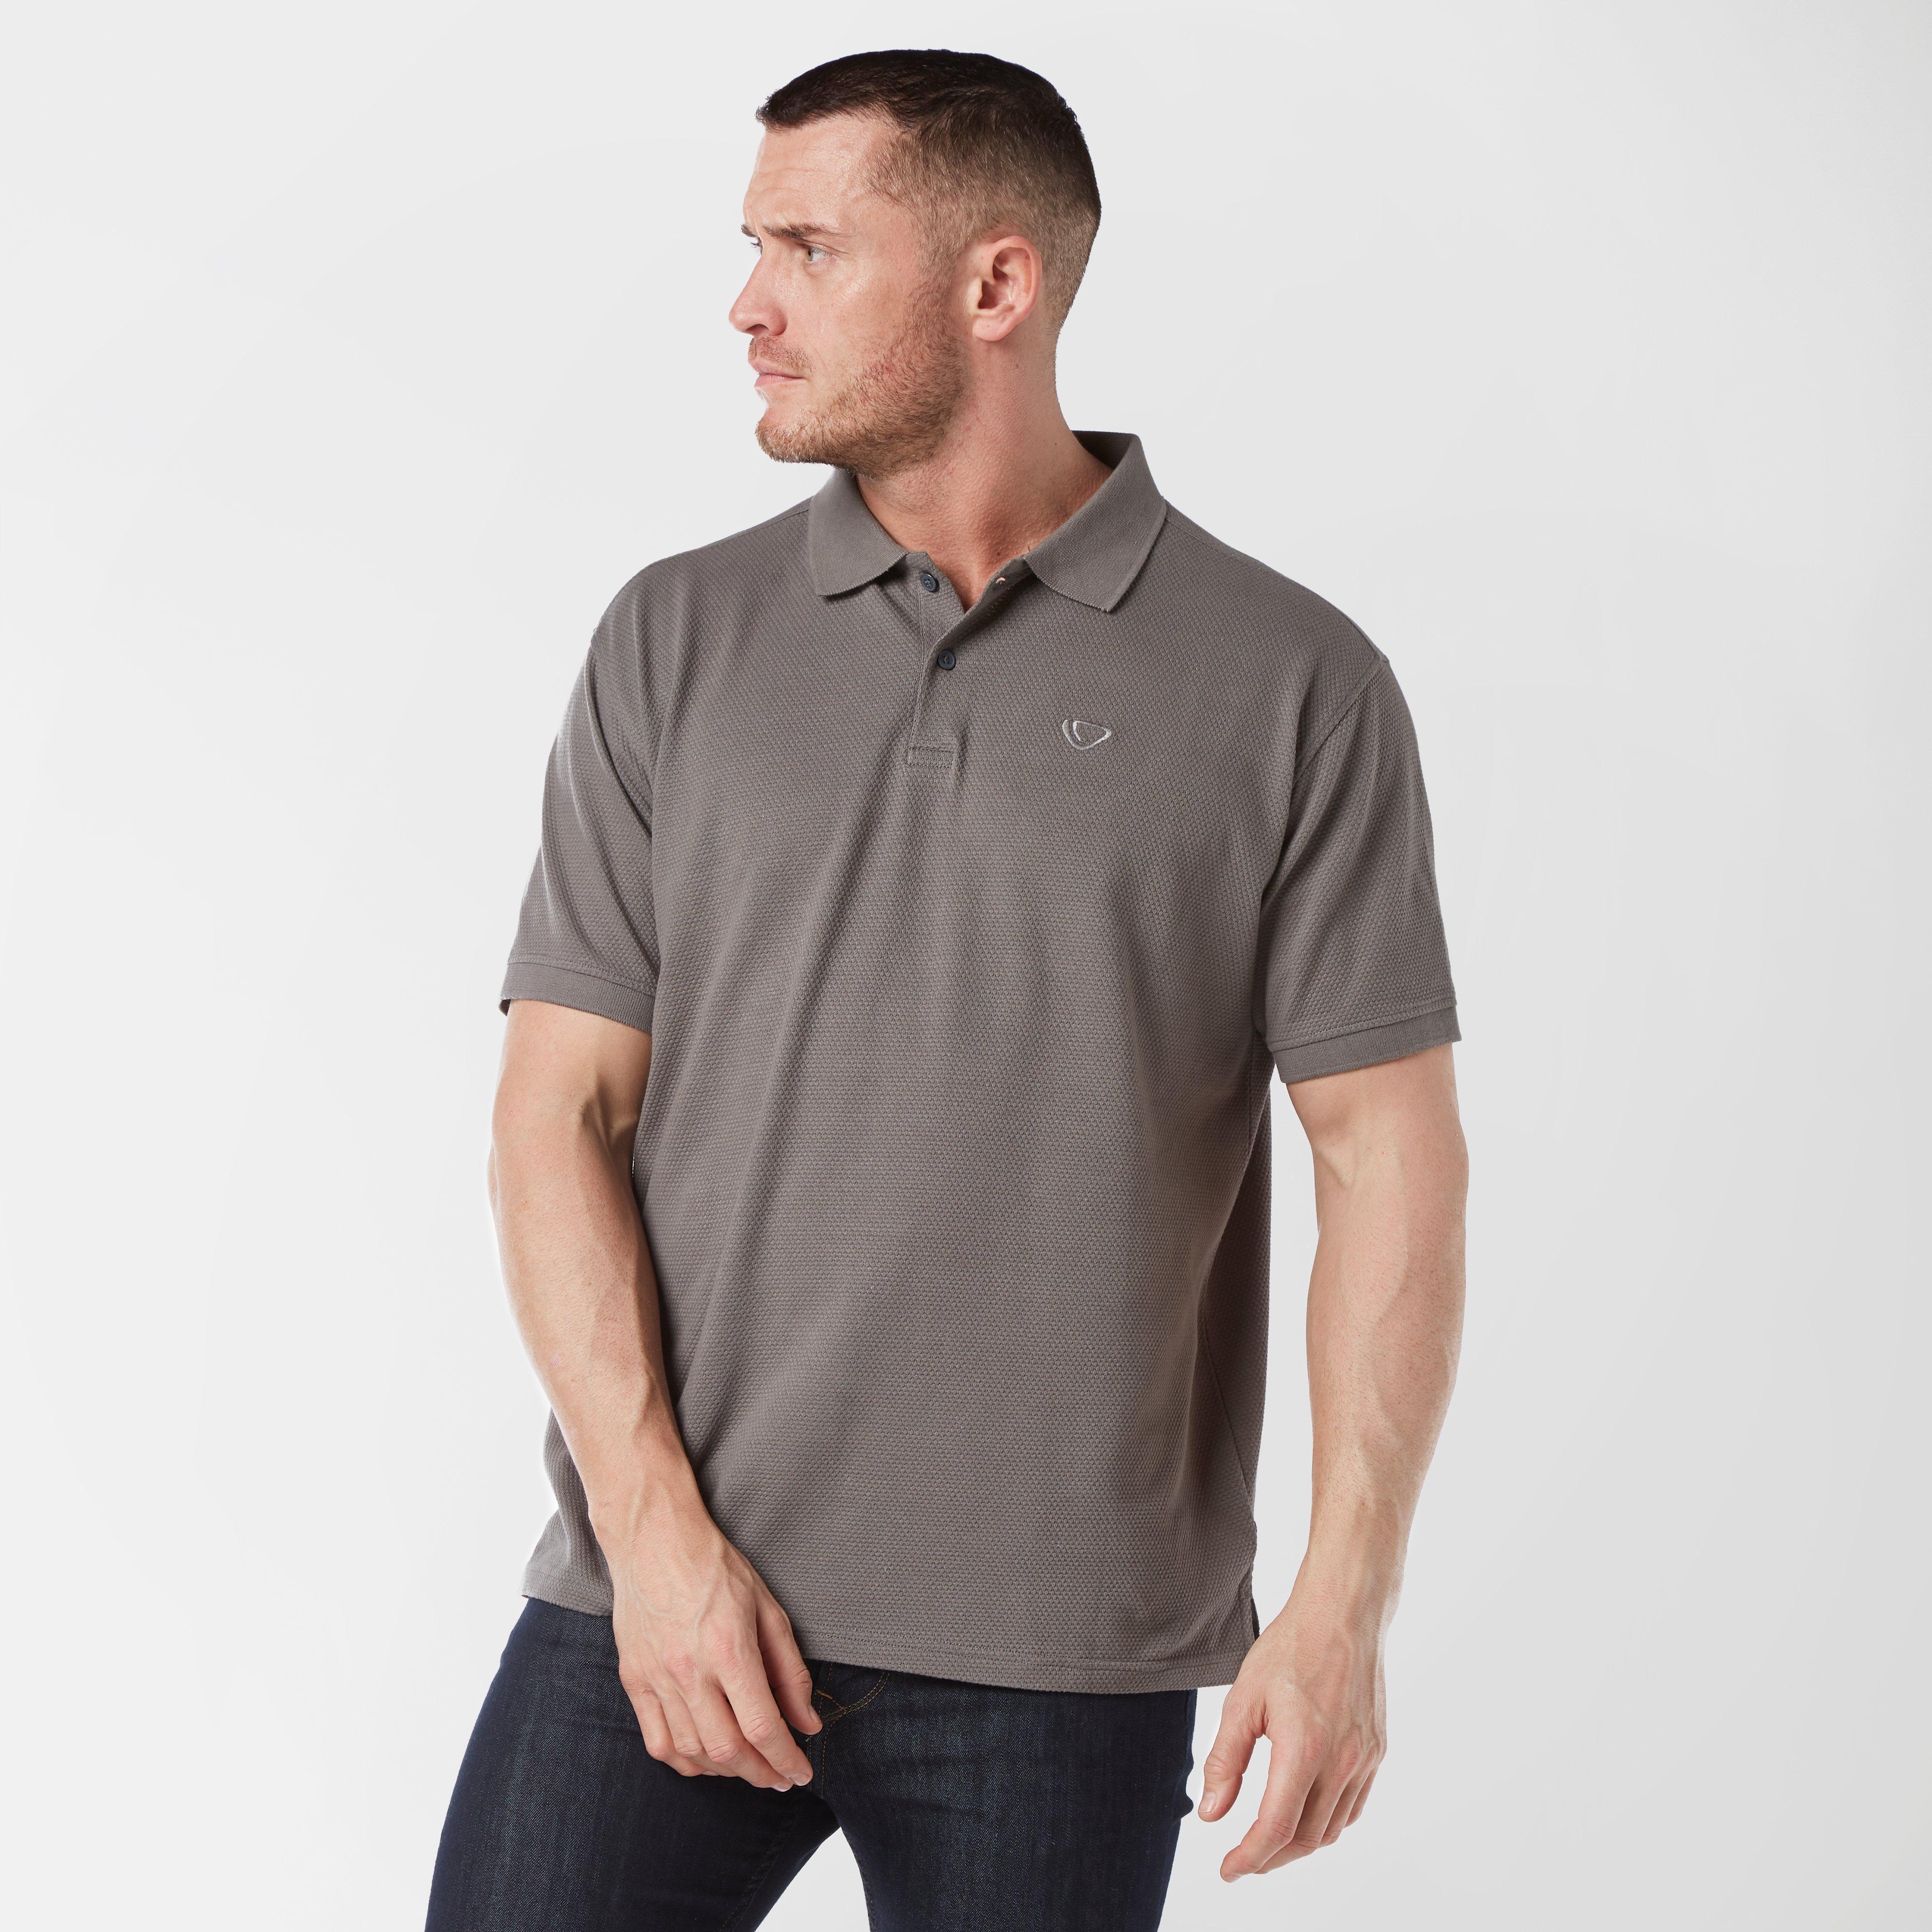 Brasher Mens Polo Shirt - Grey/dgy  Grey/dgy